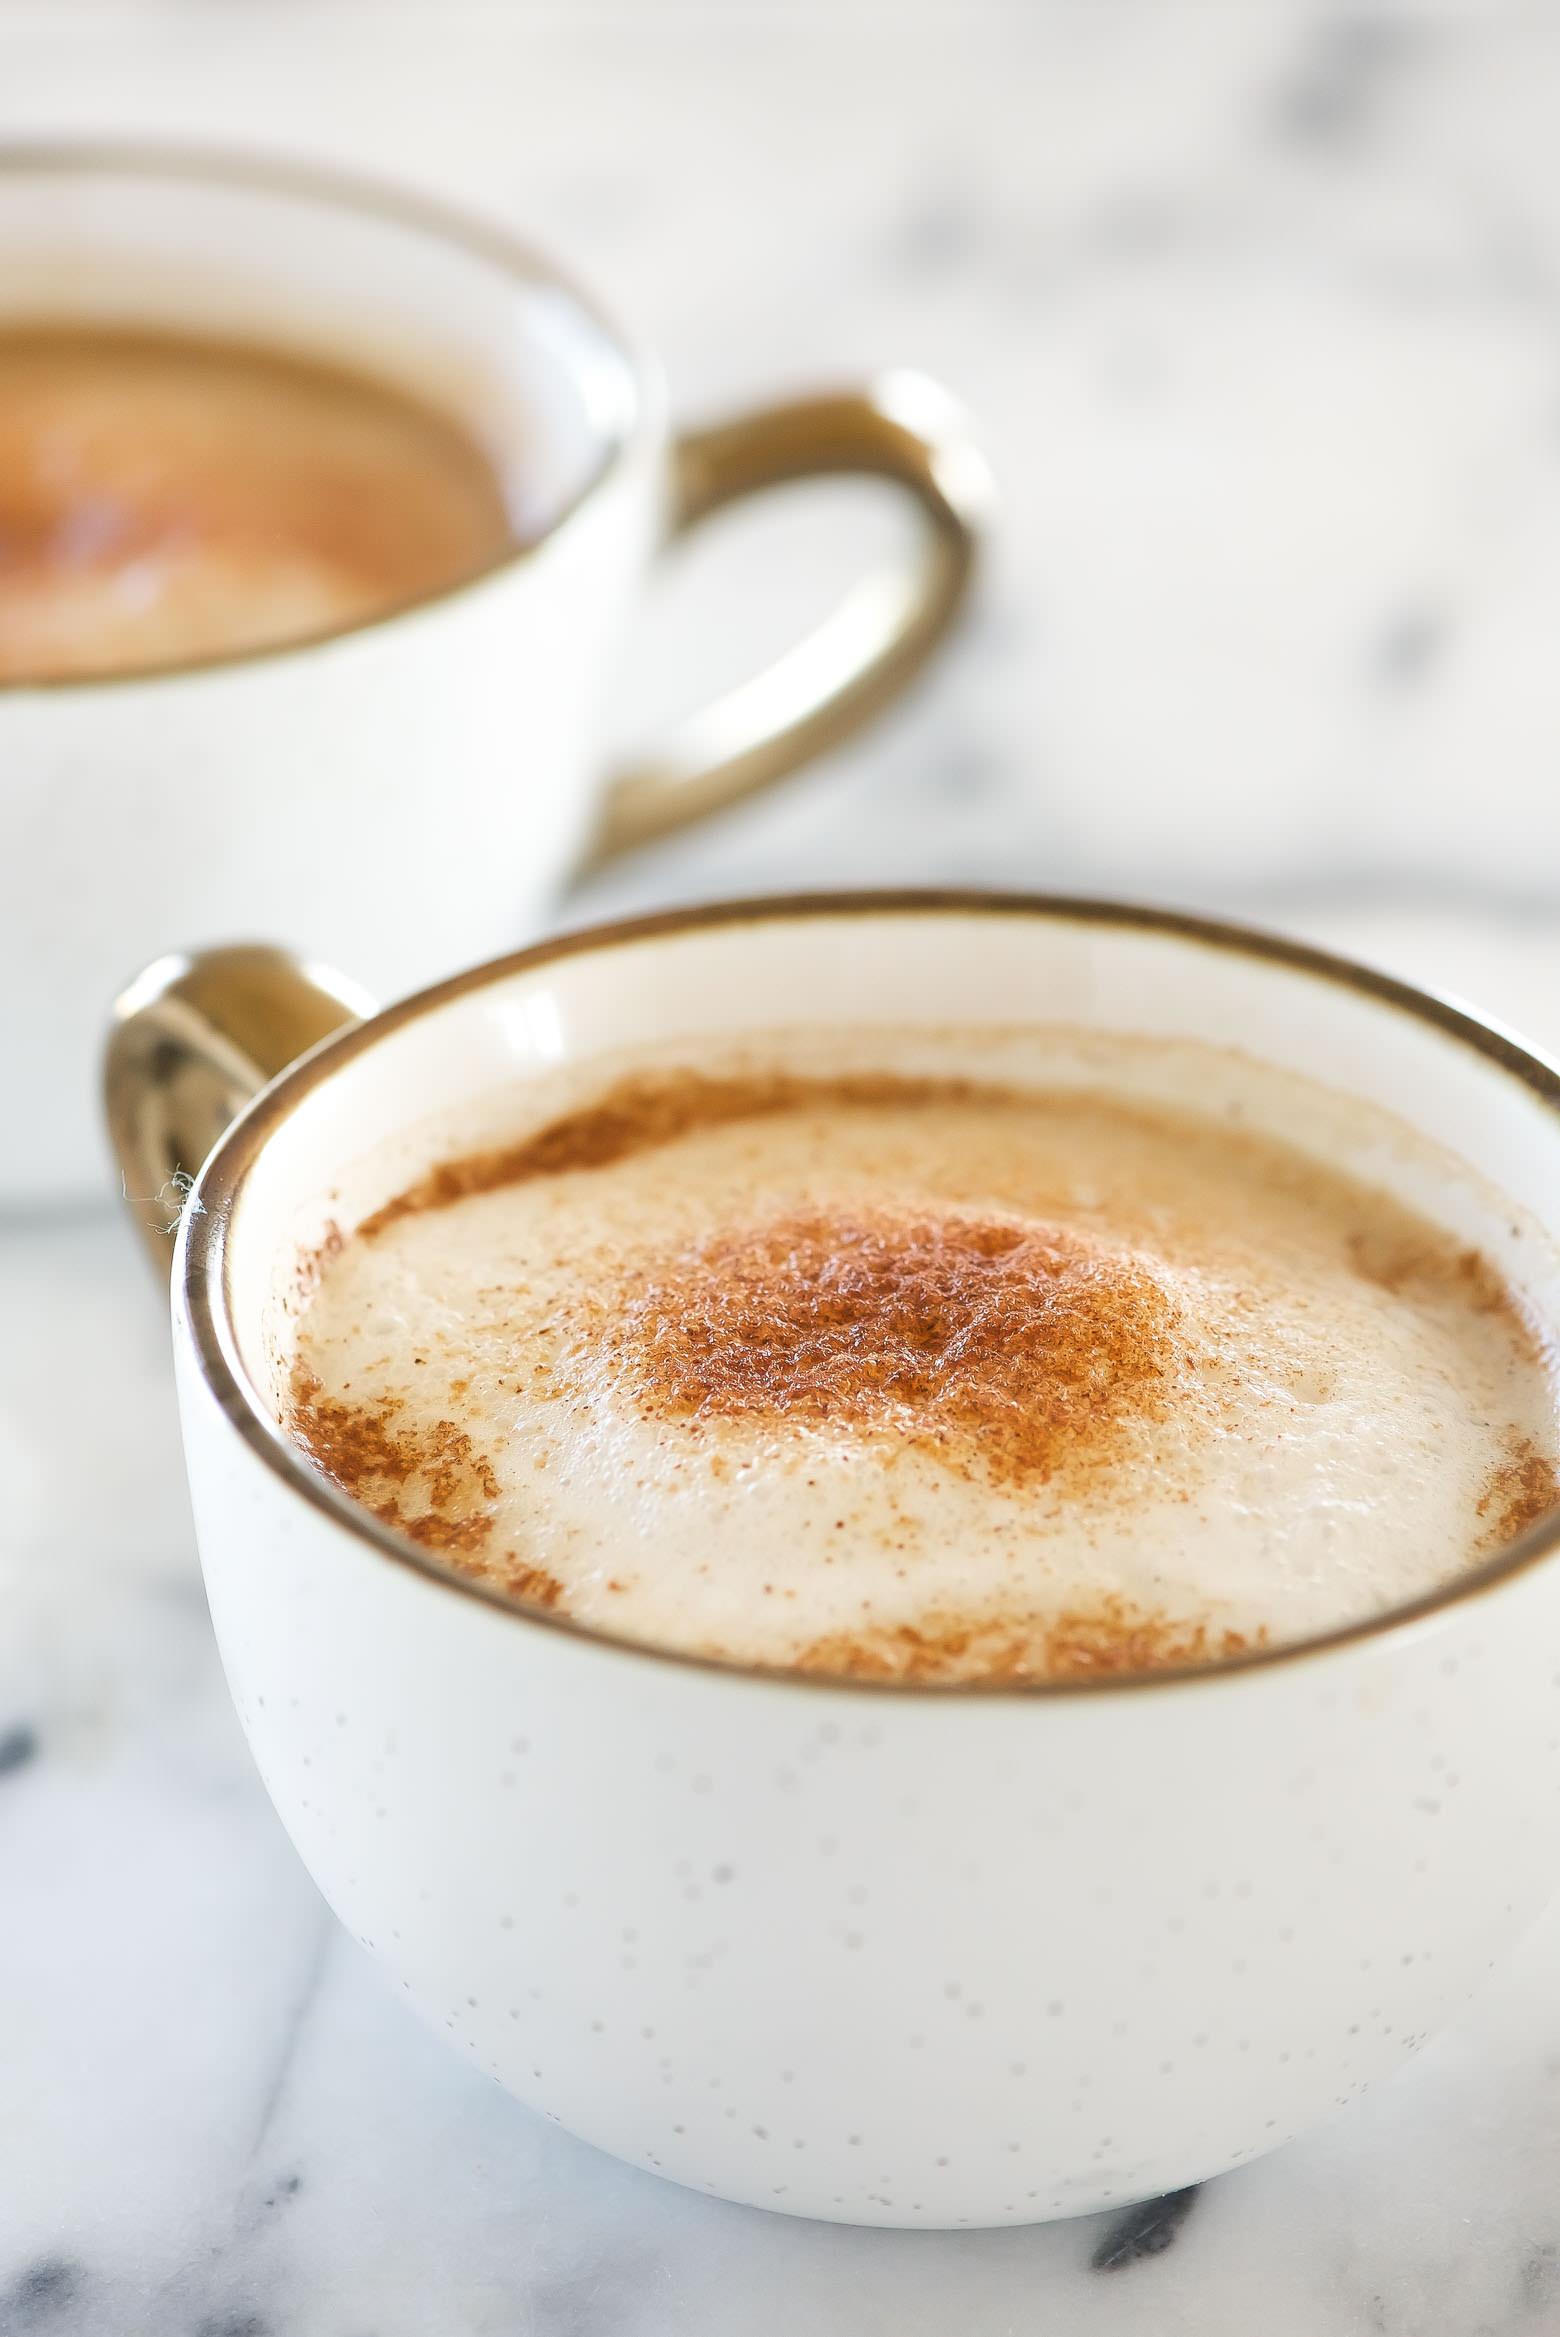 homemade cinnamon dolce syrup starbucks cinnamon dolce latte recipe iced cinnamon dolce latte recipe copycat starbucks cinnamon dolce latte